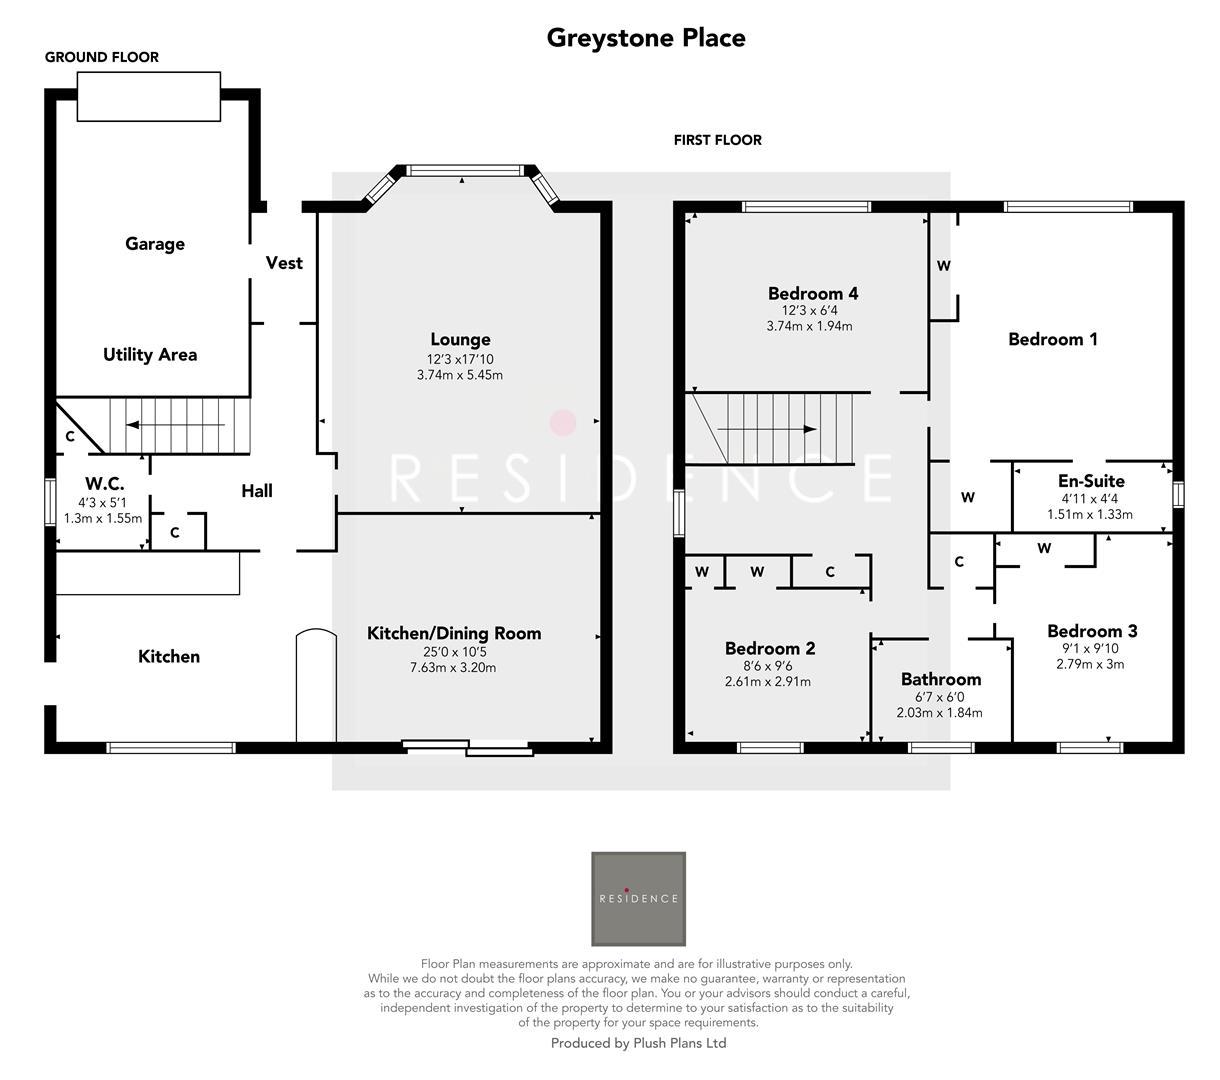 Greystone Place_FP.jpg